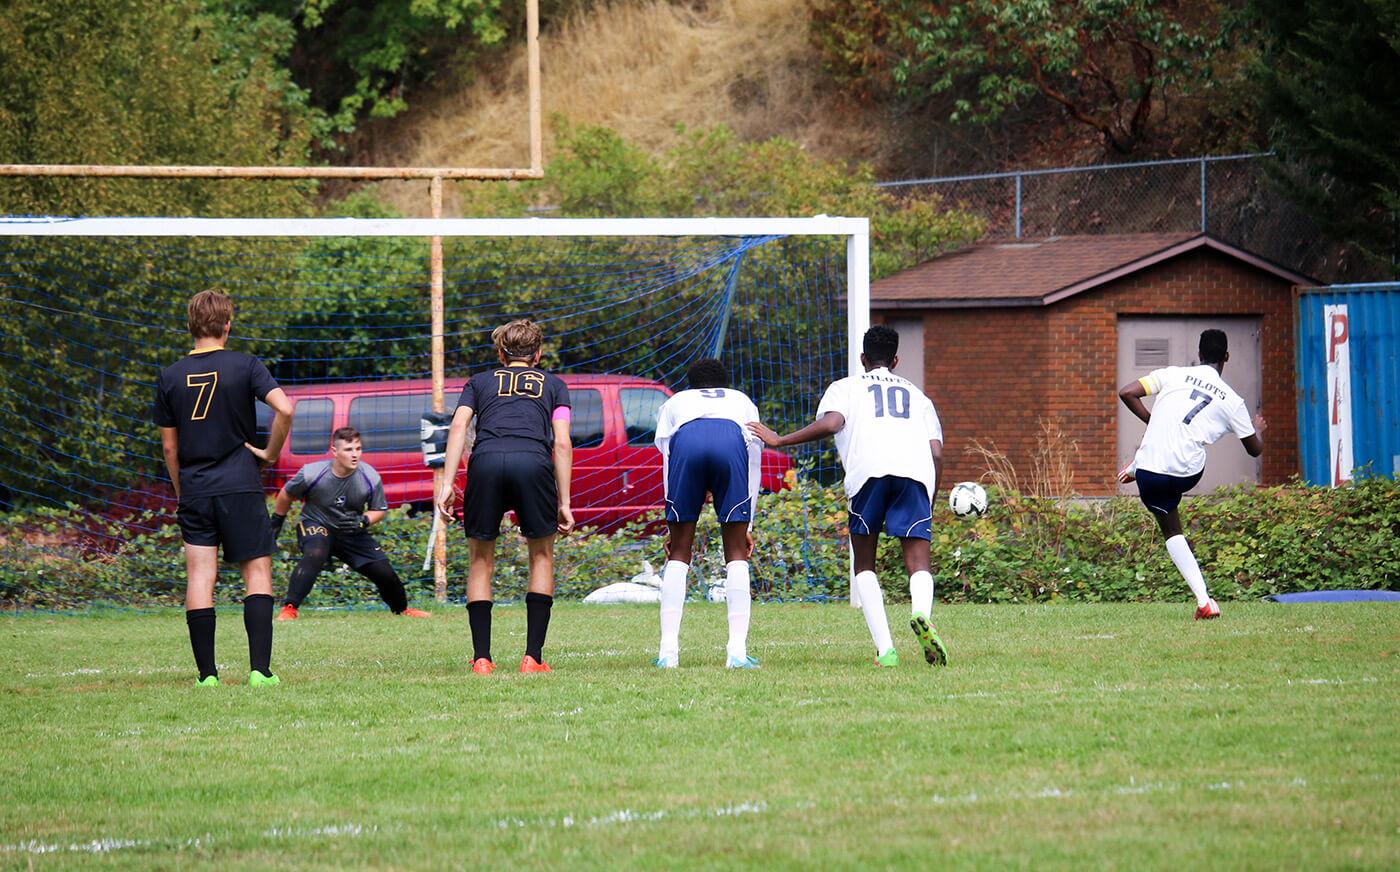 Canyonville christian academy's, boys' soccer team, kicks a penalty kick, to score a goal